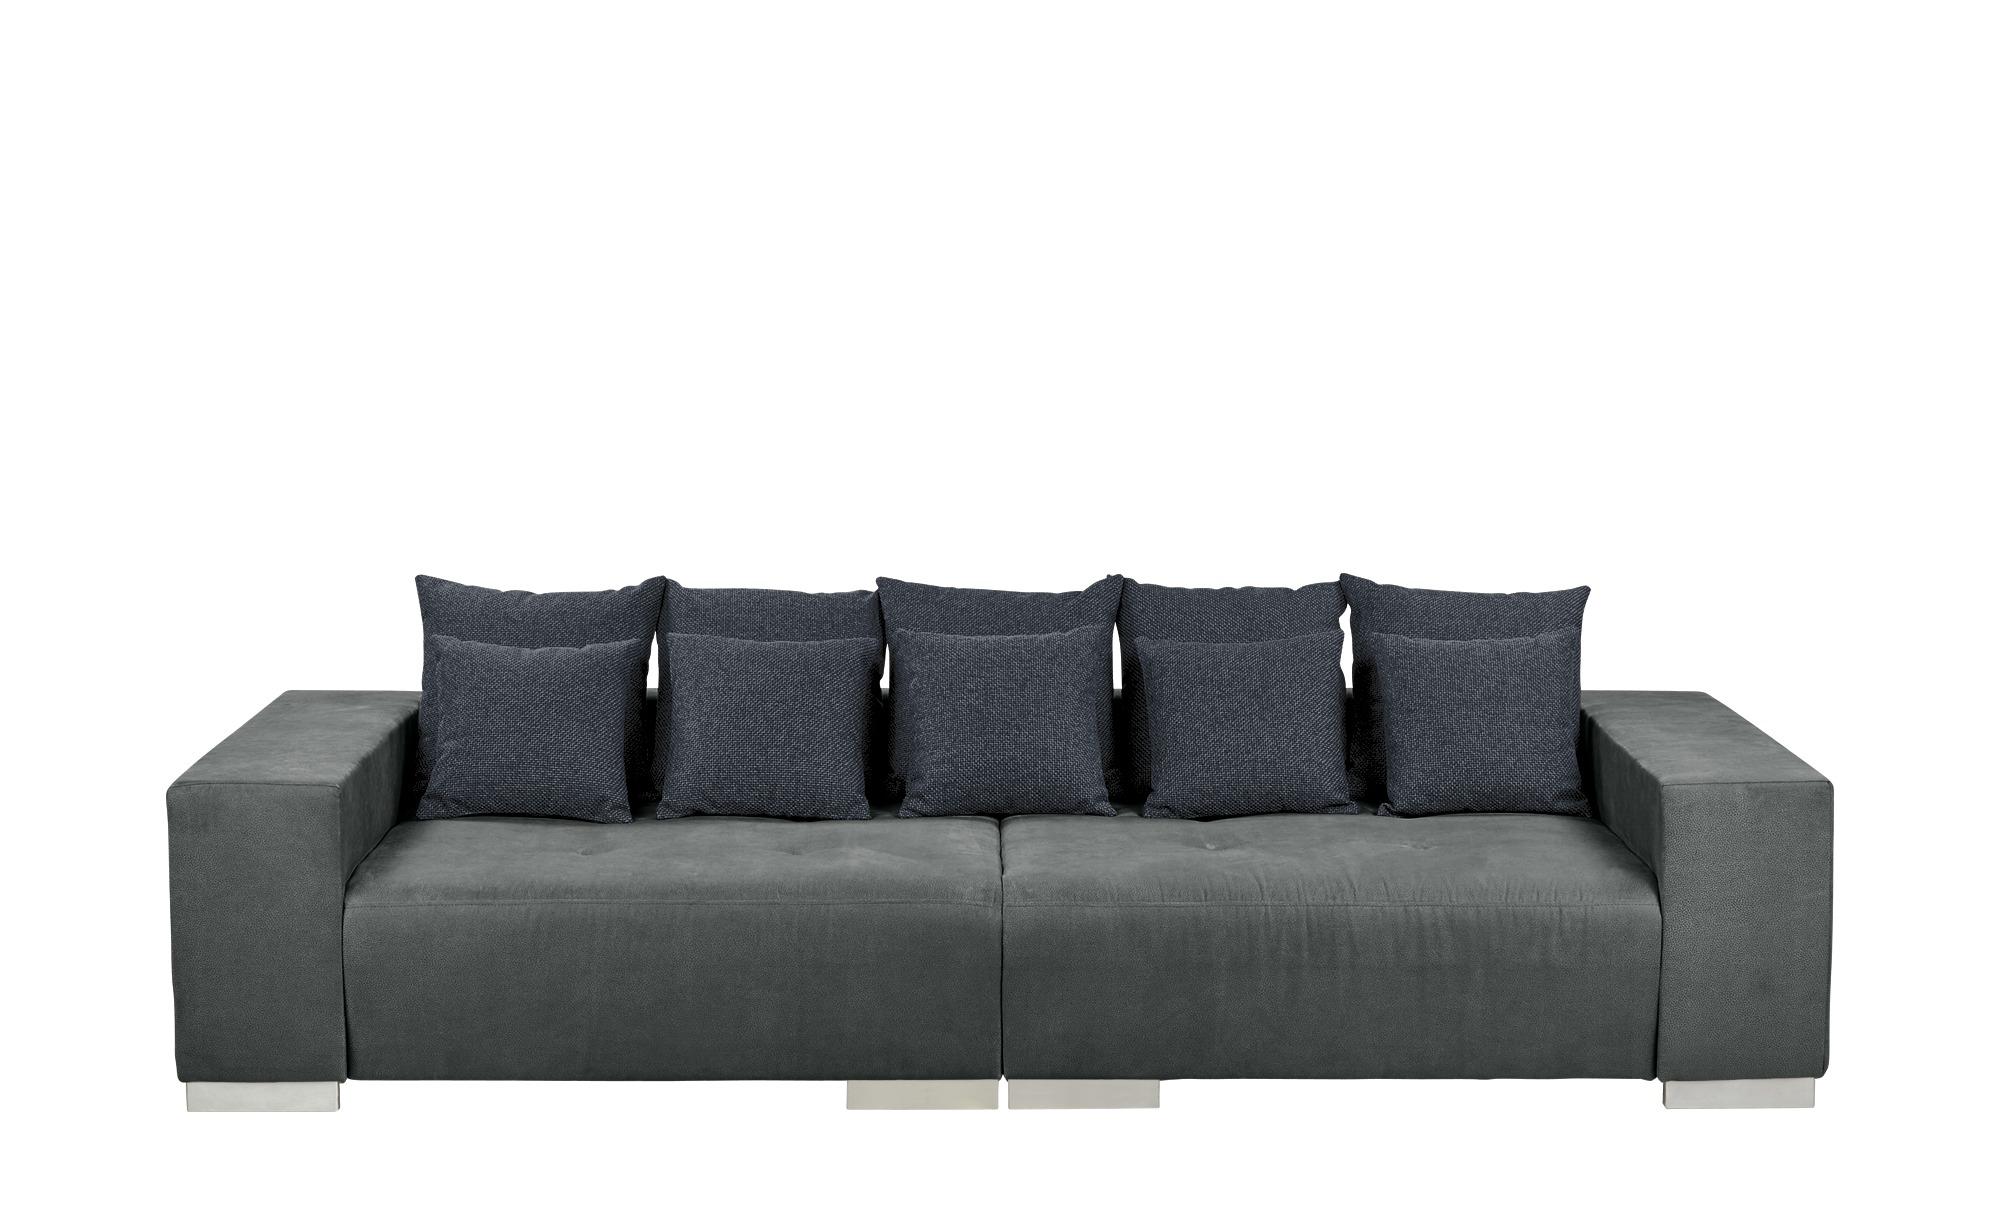 switch Big Sofa dunkelgrau - Mikrofaser Max ¦ grau ¦ Maße (cm): B: 300 H: 85 T: 136 Polstermöbel > Sofas > Big-Sofas - Höffner